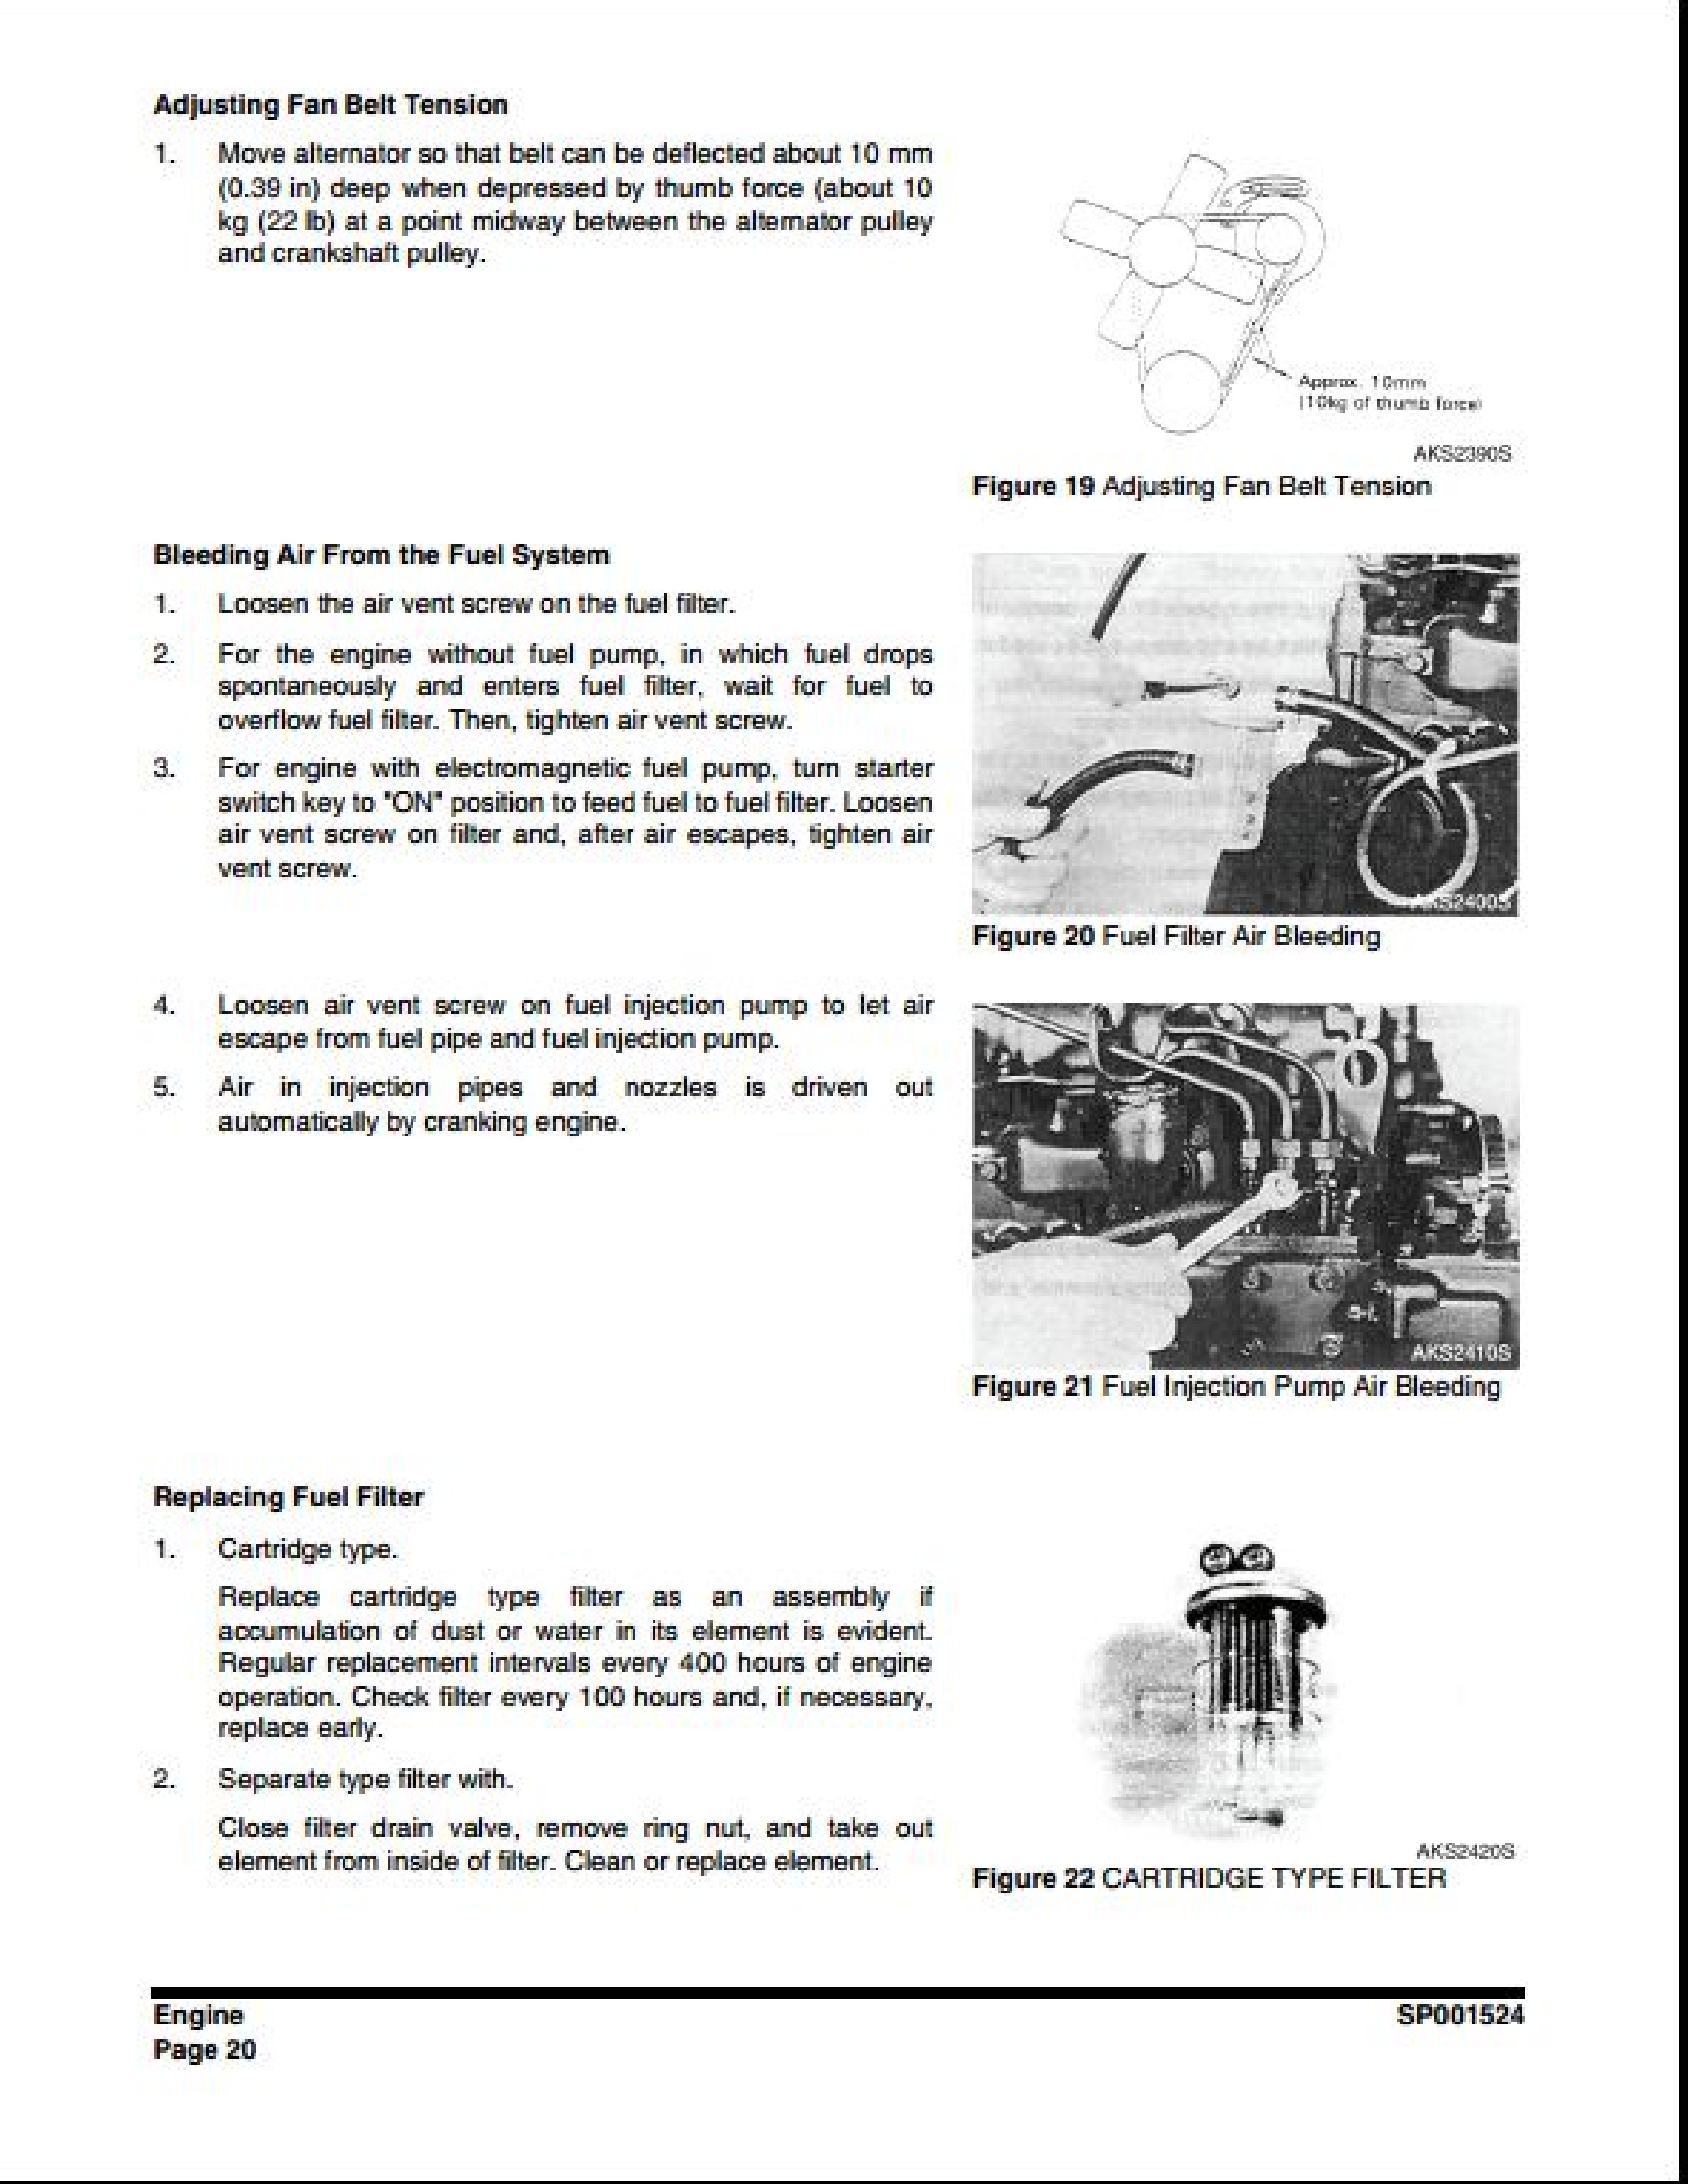 Doosan DX500LCA Crawled Excavator manual